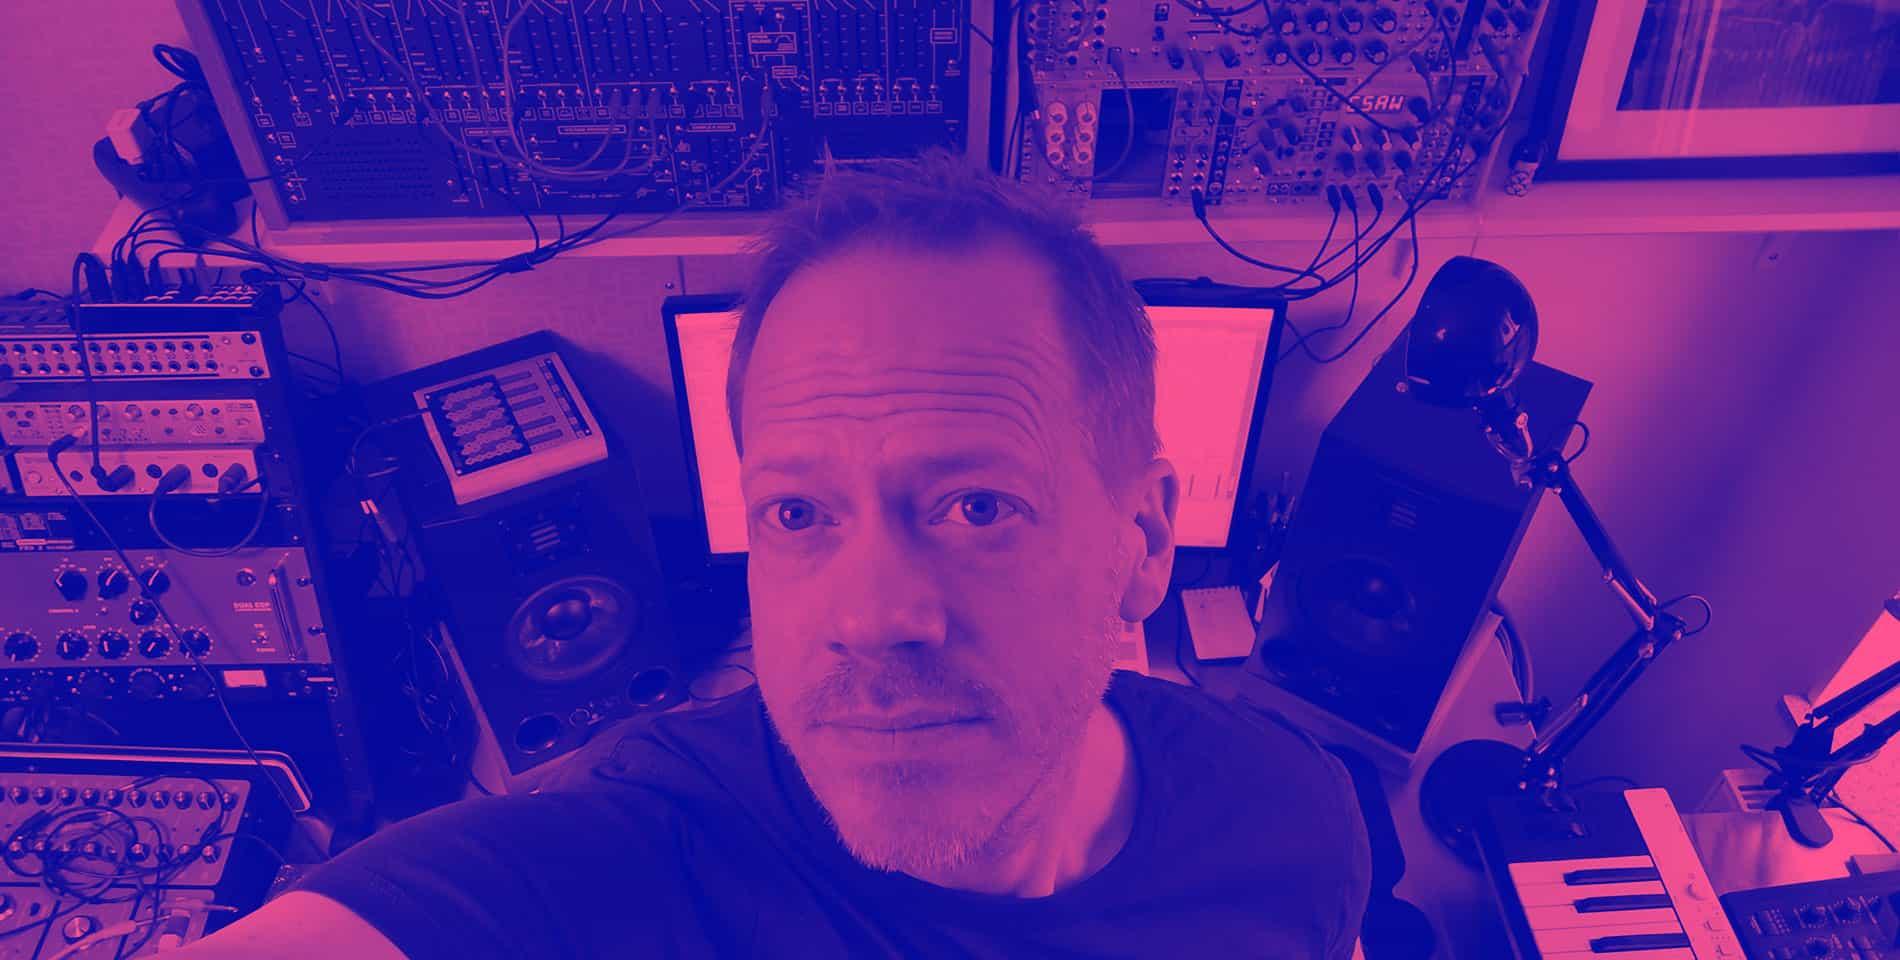 Me in the studio 2020